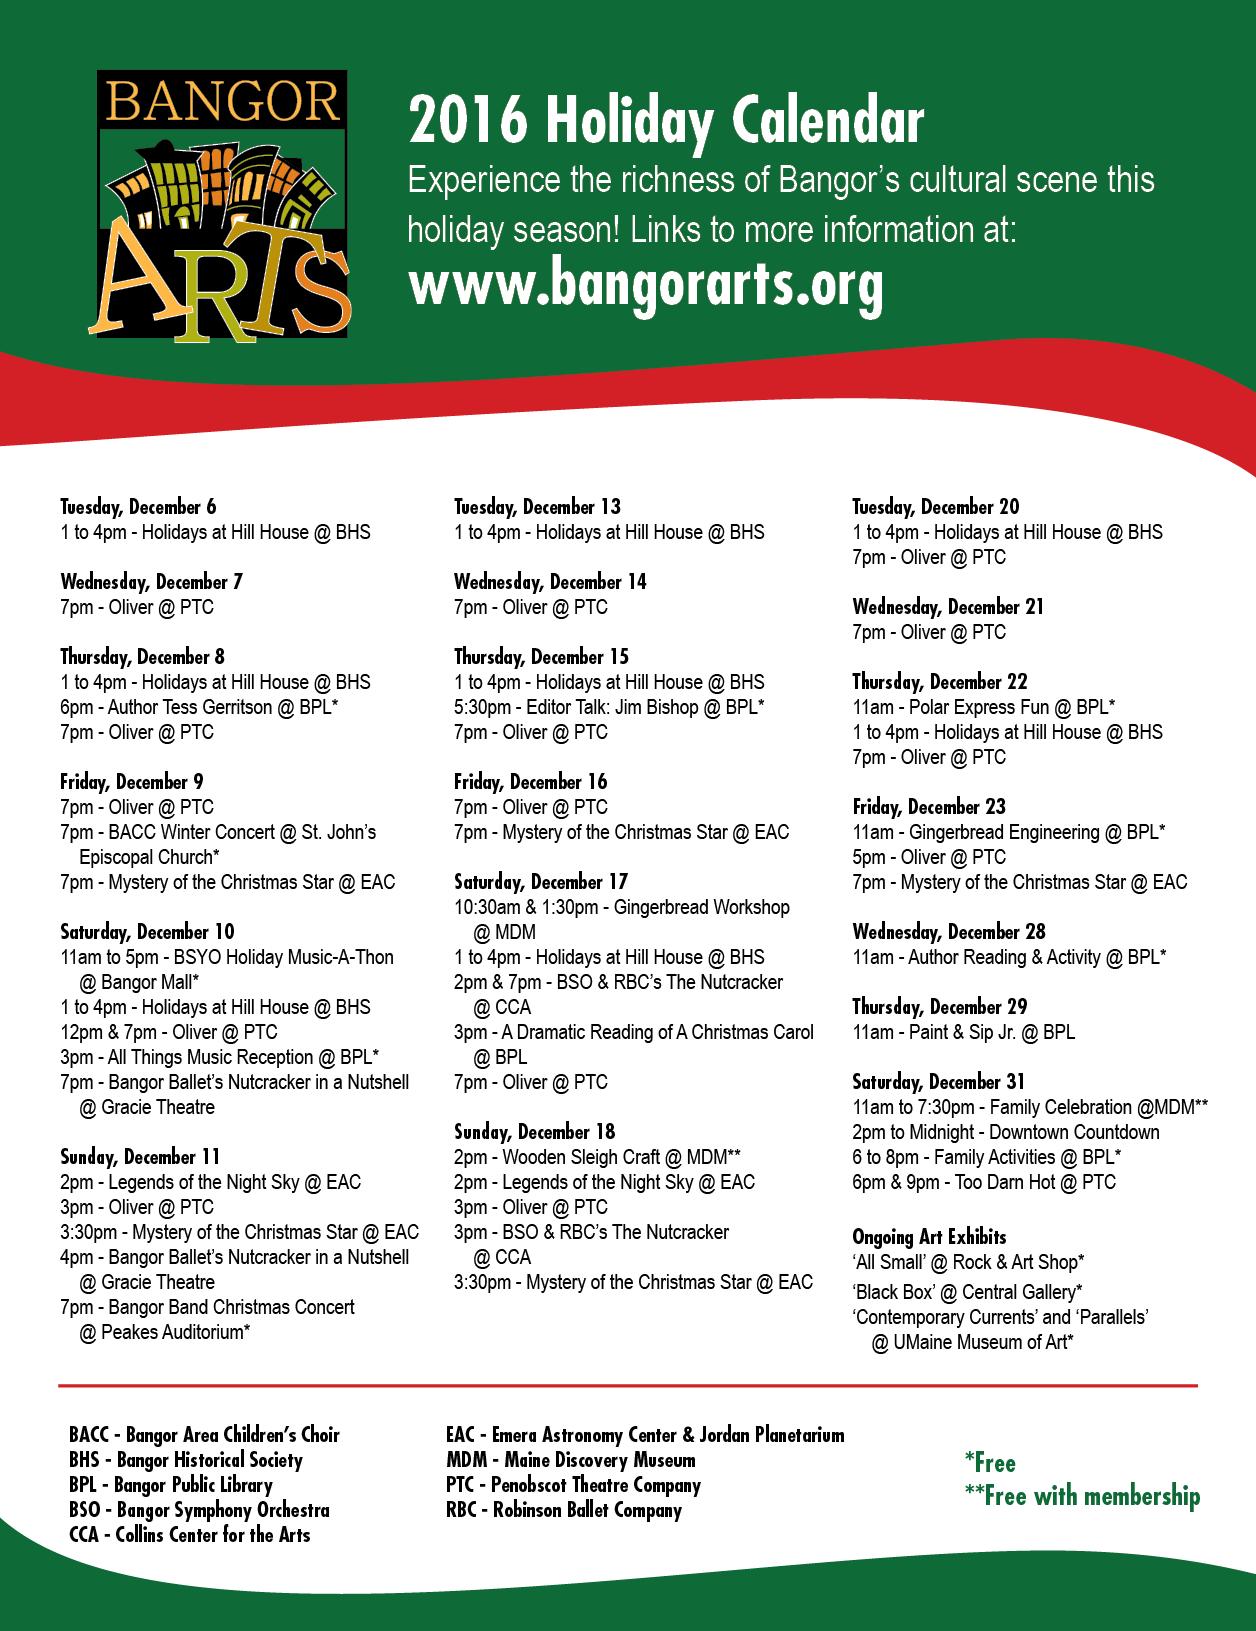 bangor-arts-holidays-2016_final_revisedweb